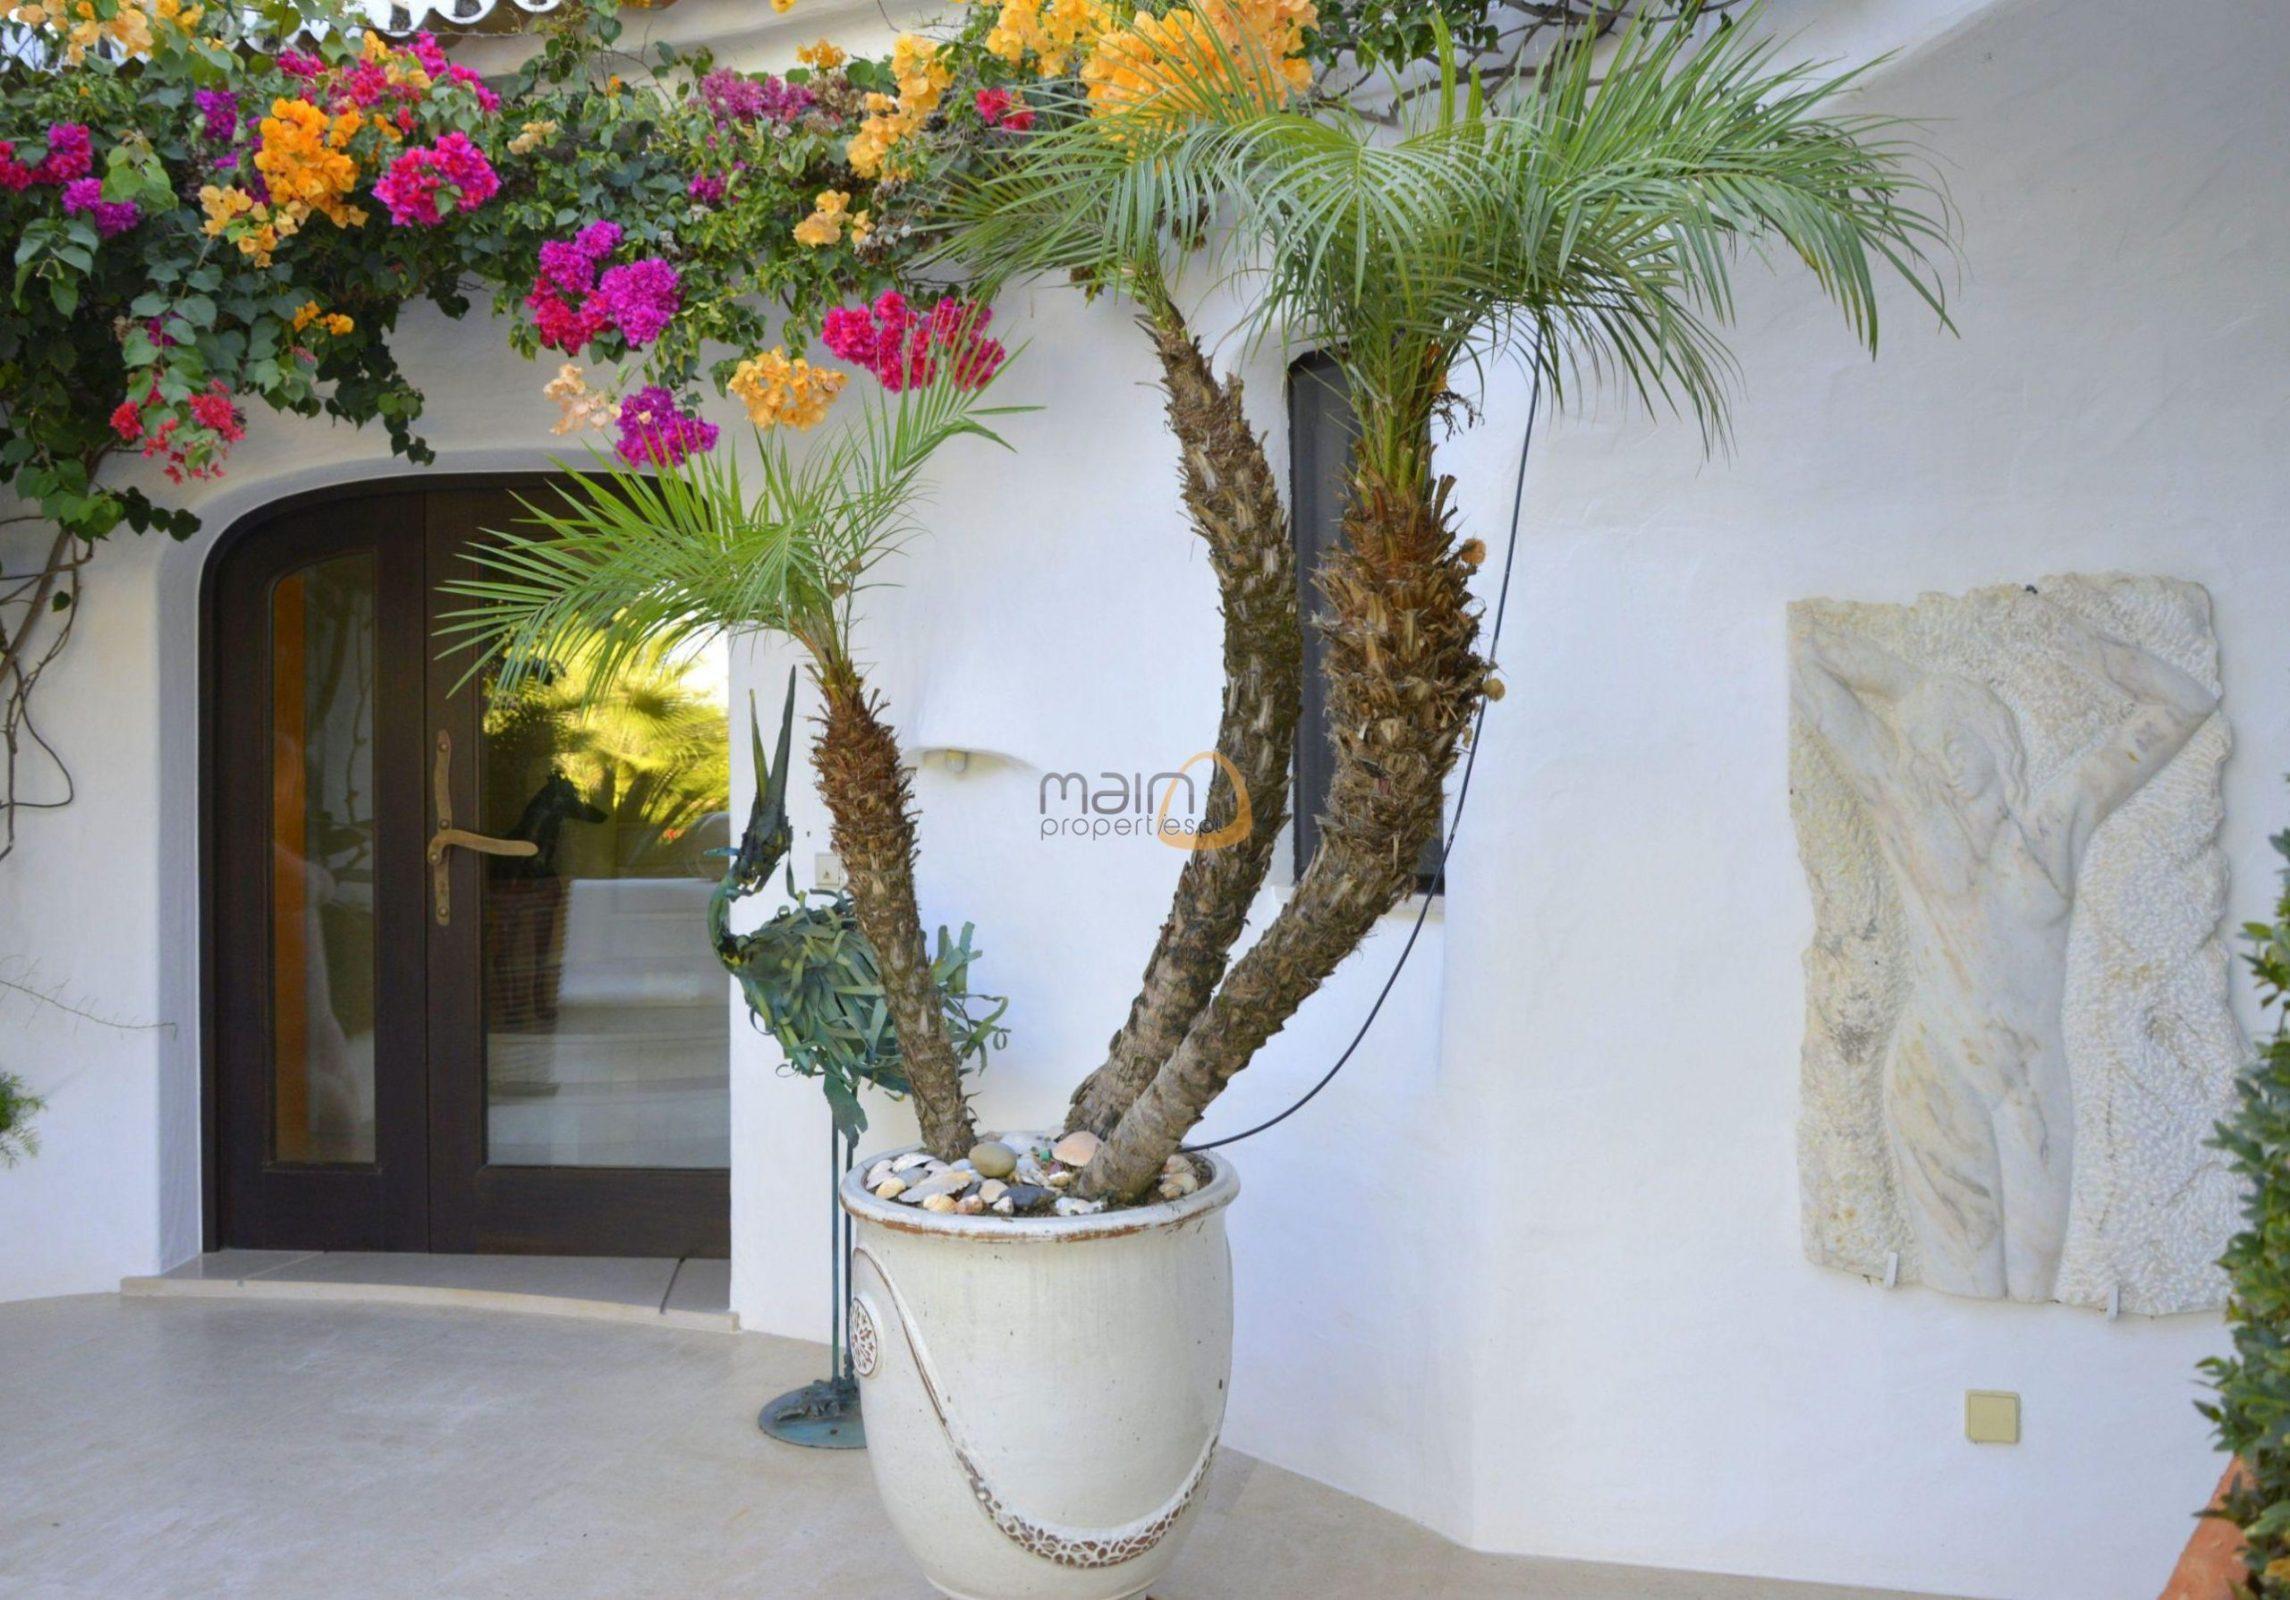 [:pt]Moradia com 5 quartos na Quinta do Lago :: Entrada 2 :: MainProperties :: 020061[:en]villa-quinta-do-lago-algarve-portugal-020061-13[:]